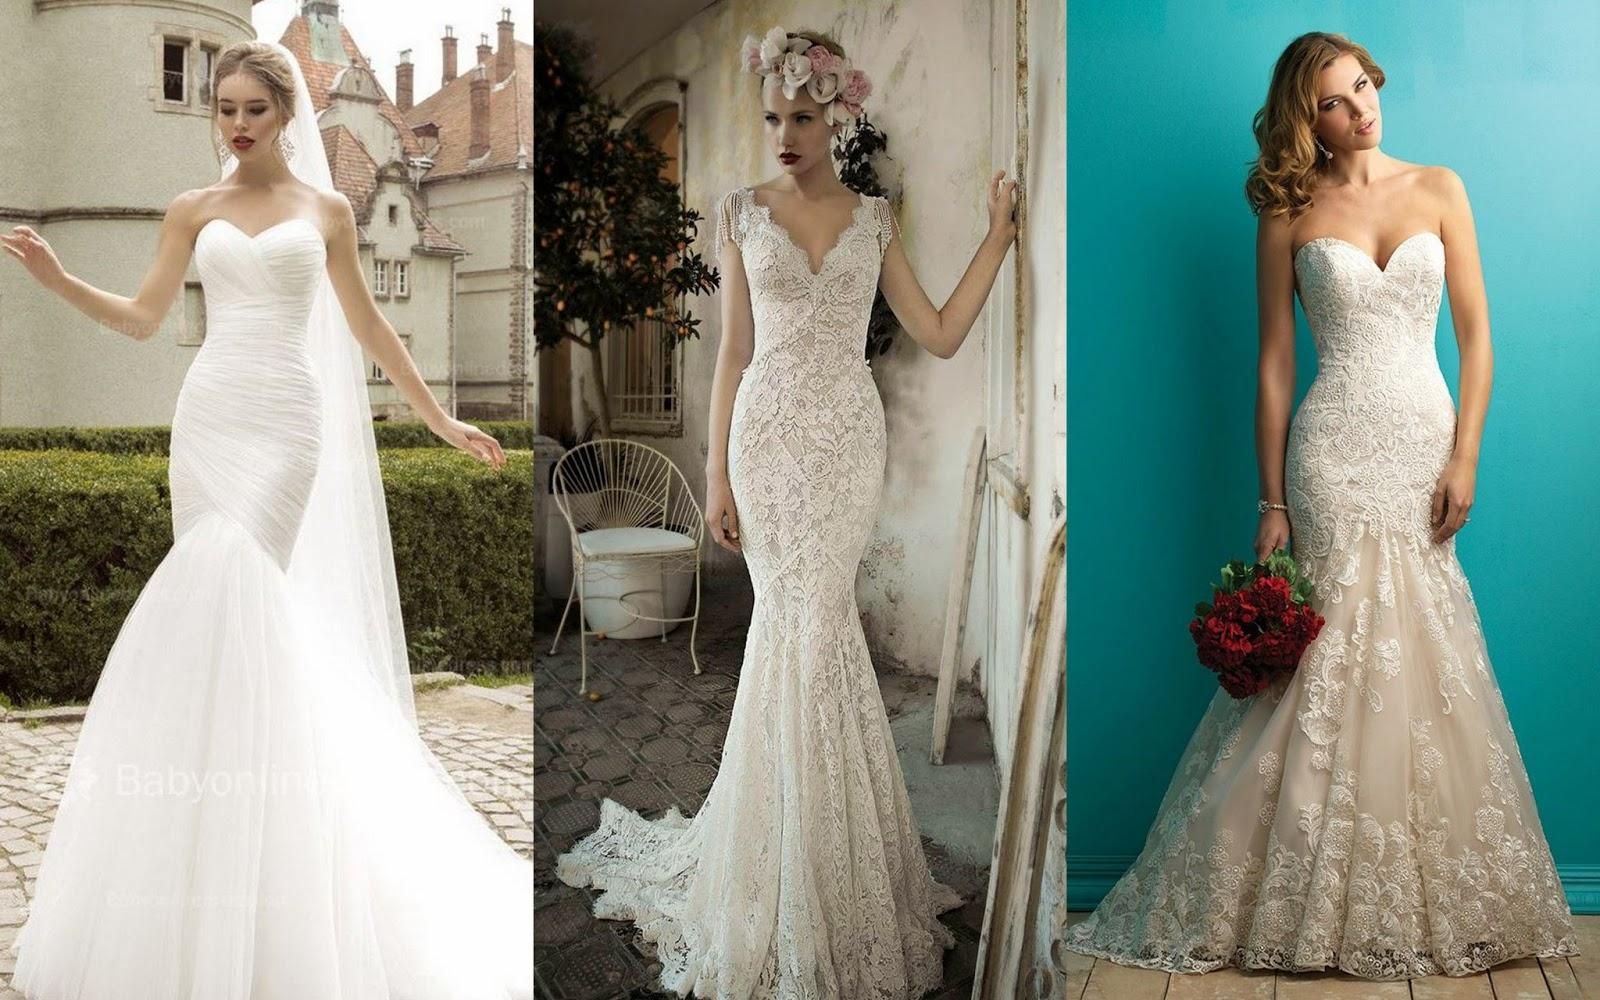 Mermaid Wedding Dress Body Type